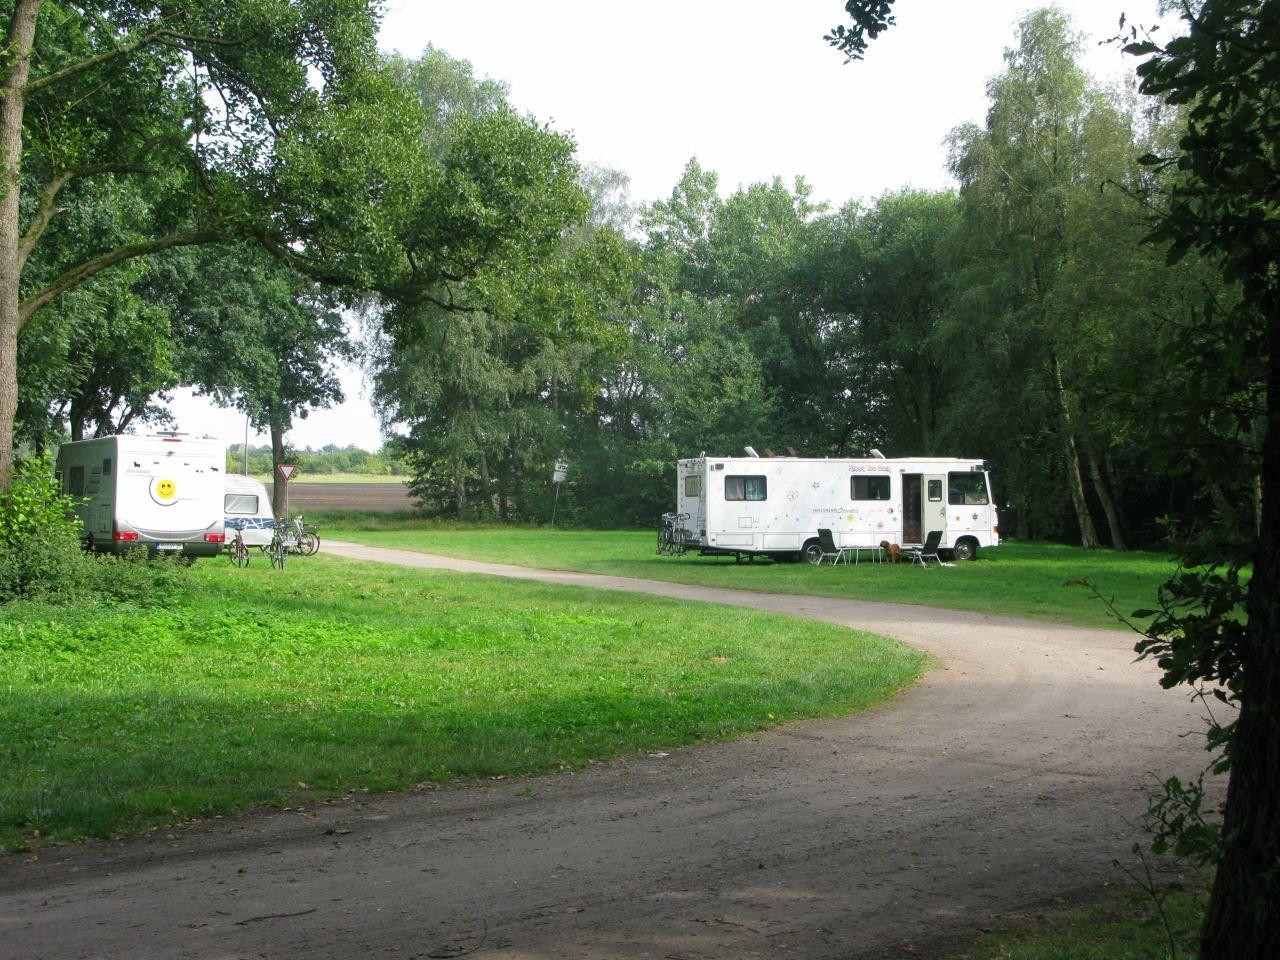 Gratis Wohnmobil Stellplatz, Lüneburger Heide 🙂 – MojoBusLife